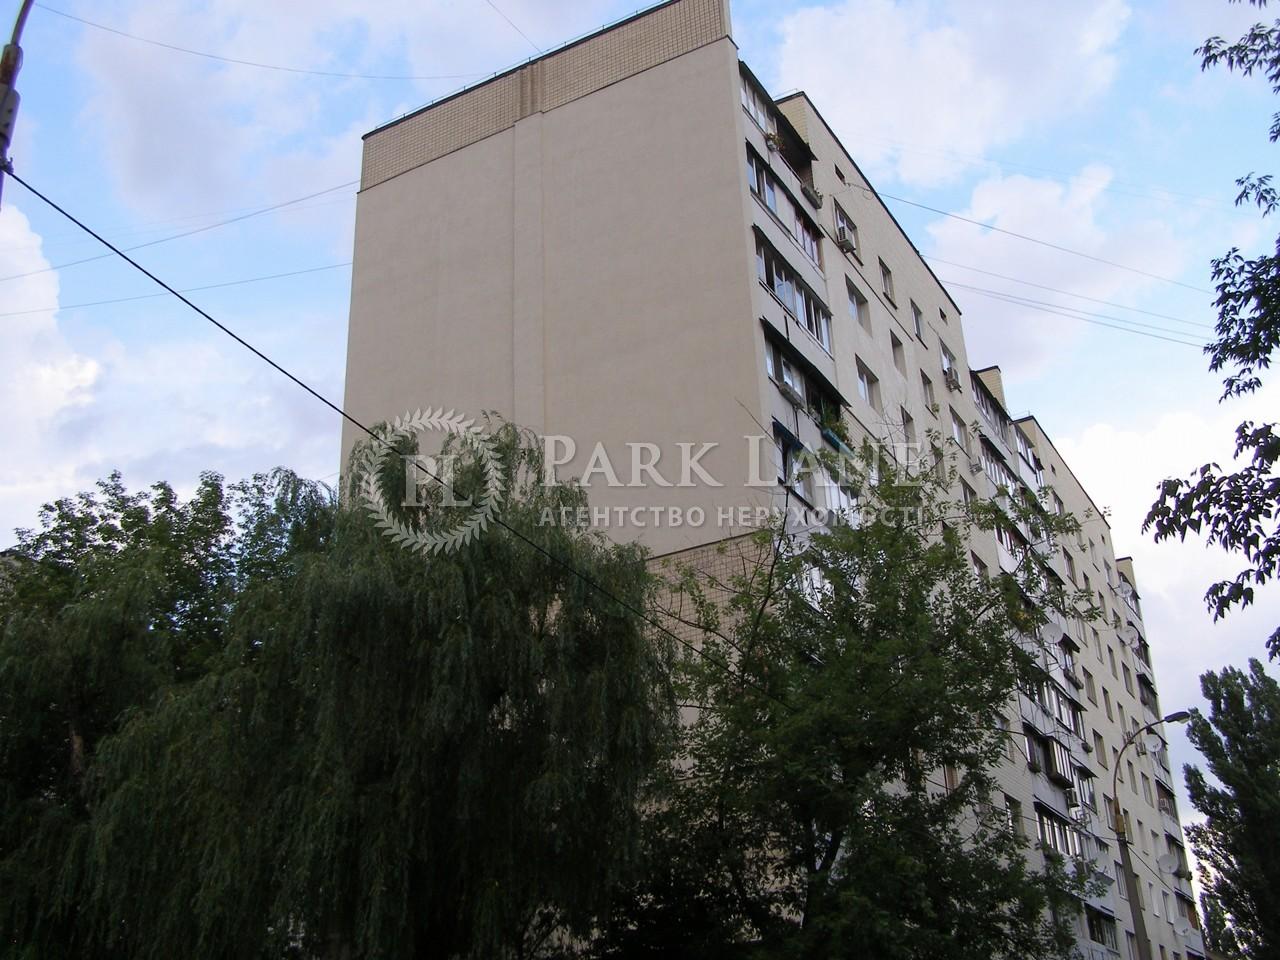 Квартира ул. Богдановская, 4, Киев, Z-548036 - Фото 1